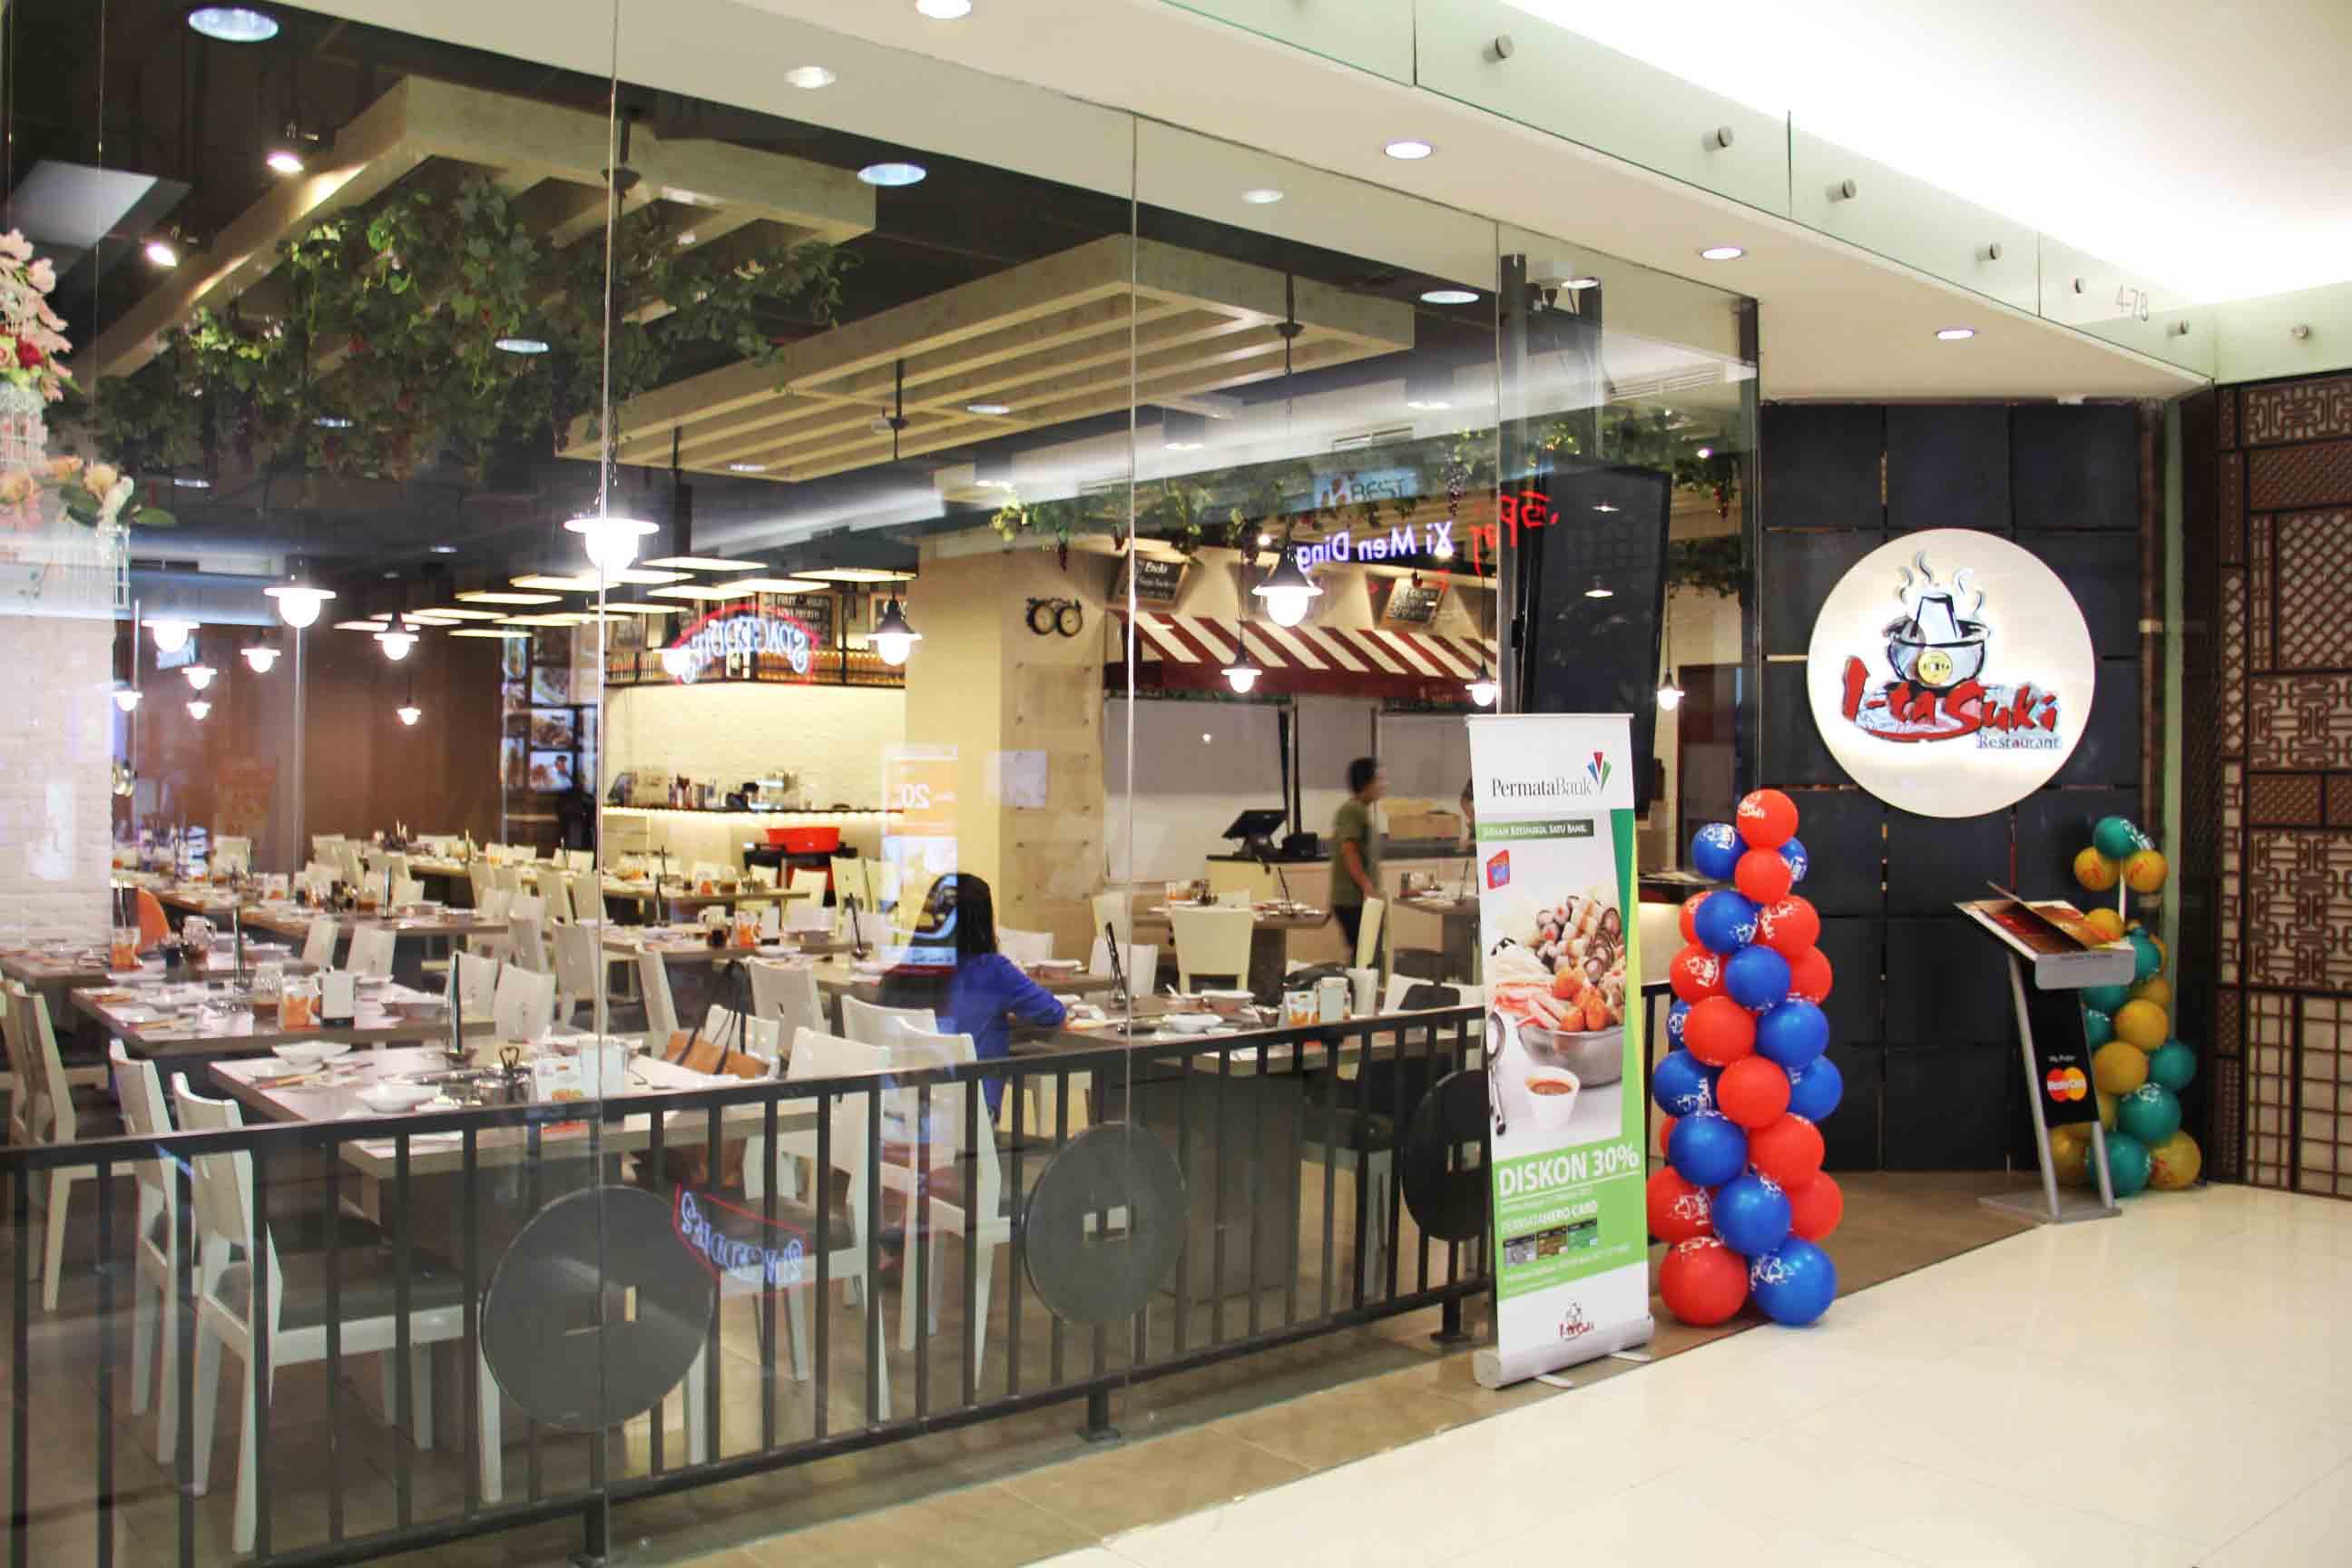 Co Associates I-Ta Suki Restaurant Senayan City, Jakarta Senayan City, Jakarta Front View   18136